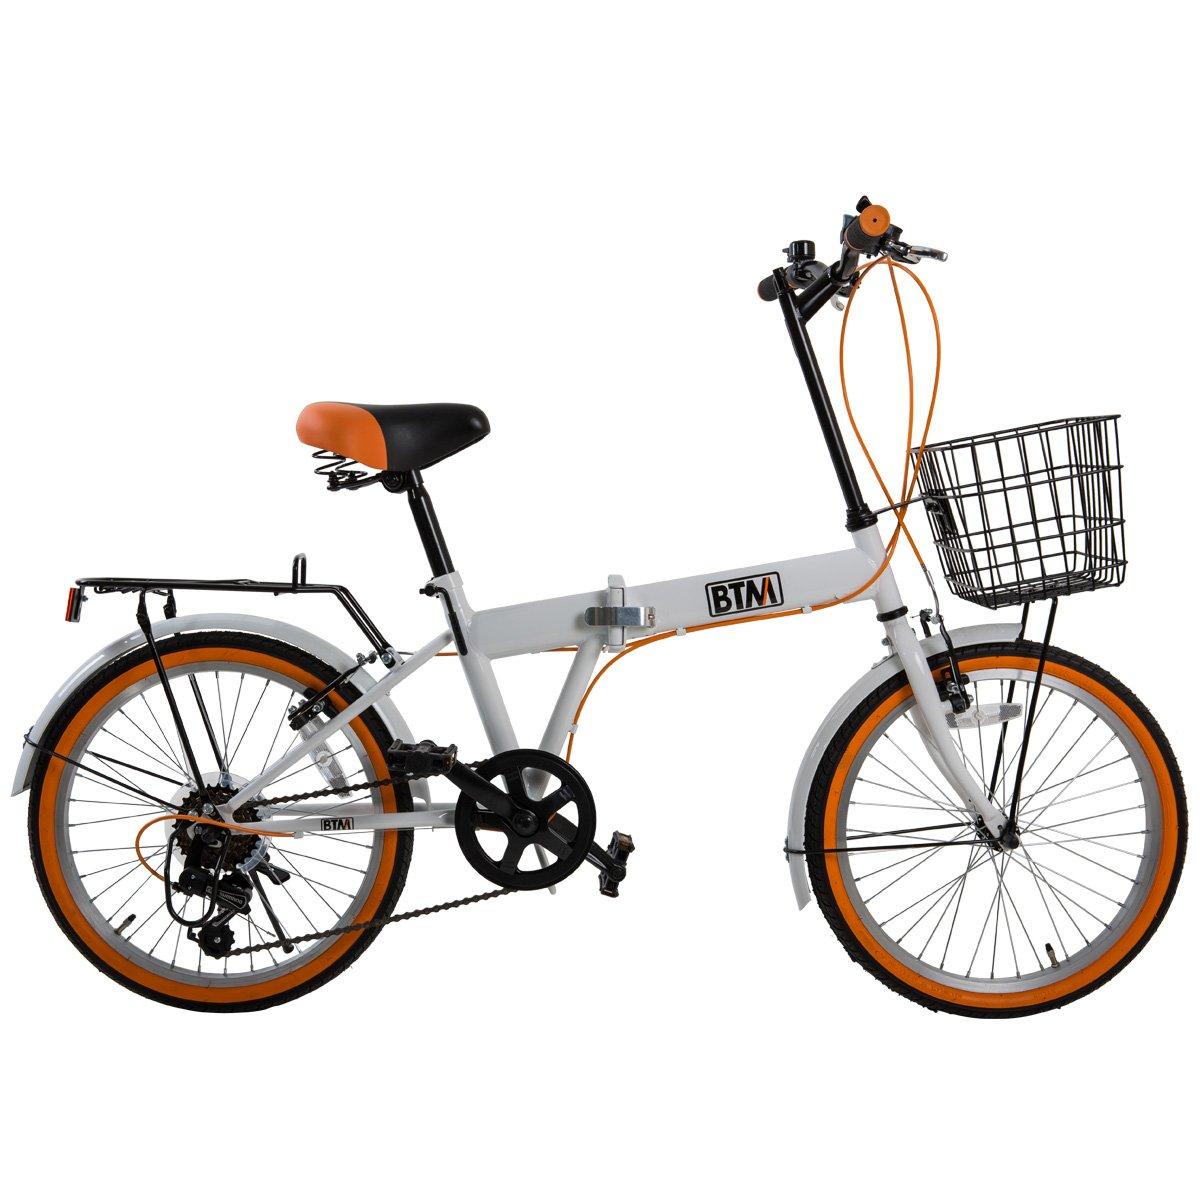 (BTM) 折りたたみ自転車 自転車 20インチ シマノ6段変速 カゴ標準付き 荷台付き 鍵ライト付 バイク 通勤 通学 街乗り PL保険付 【一年安心保障】 B071WJXNZ7 ホワイト+オレンジ ホワイト+オレンジ